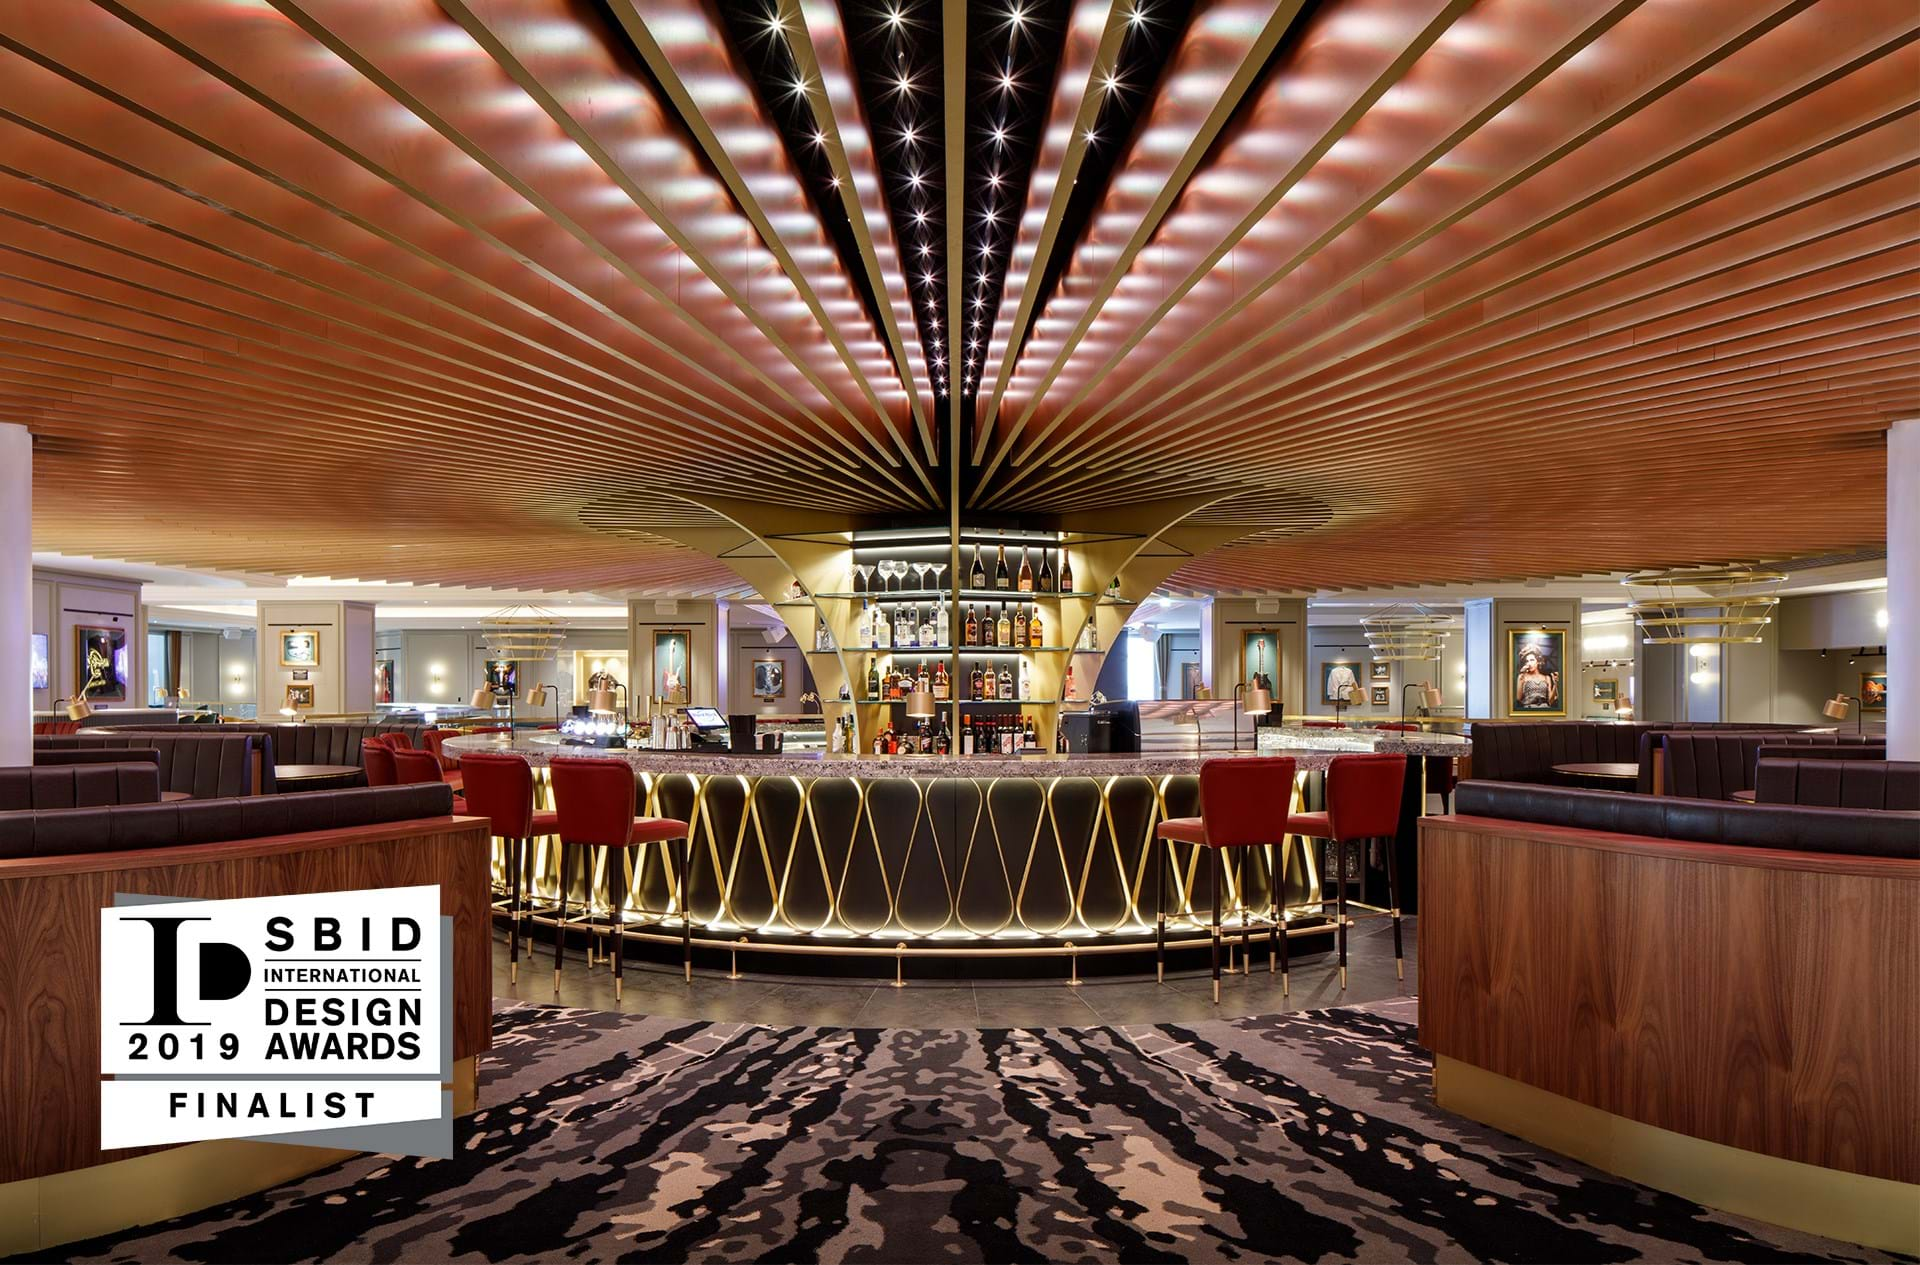 Hard Rock Hotel London A Finalist At The Sbid International Design Awards